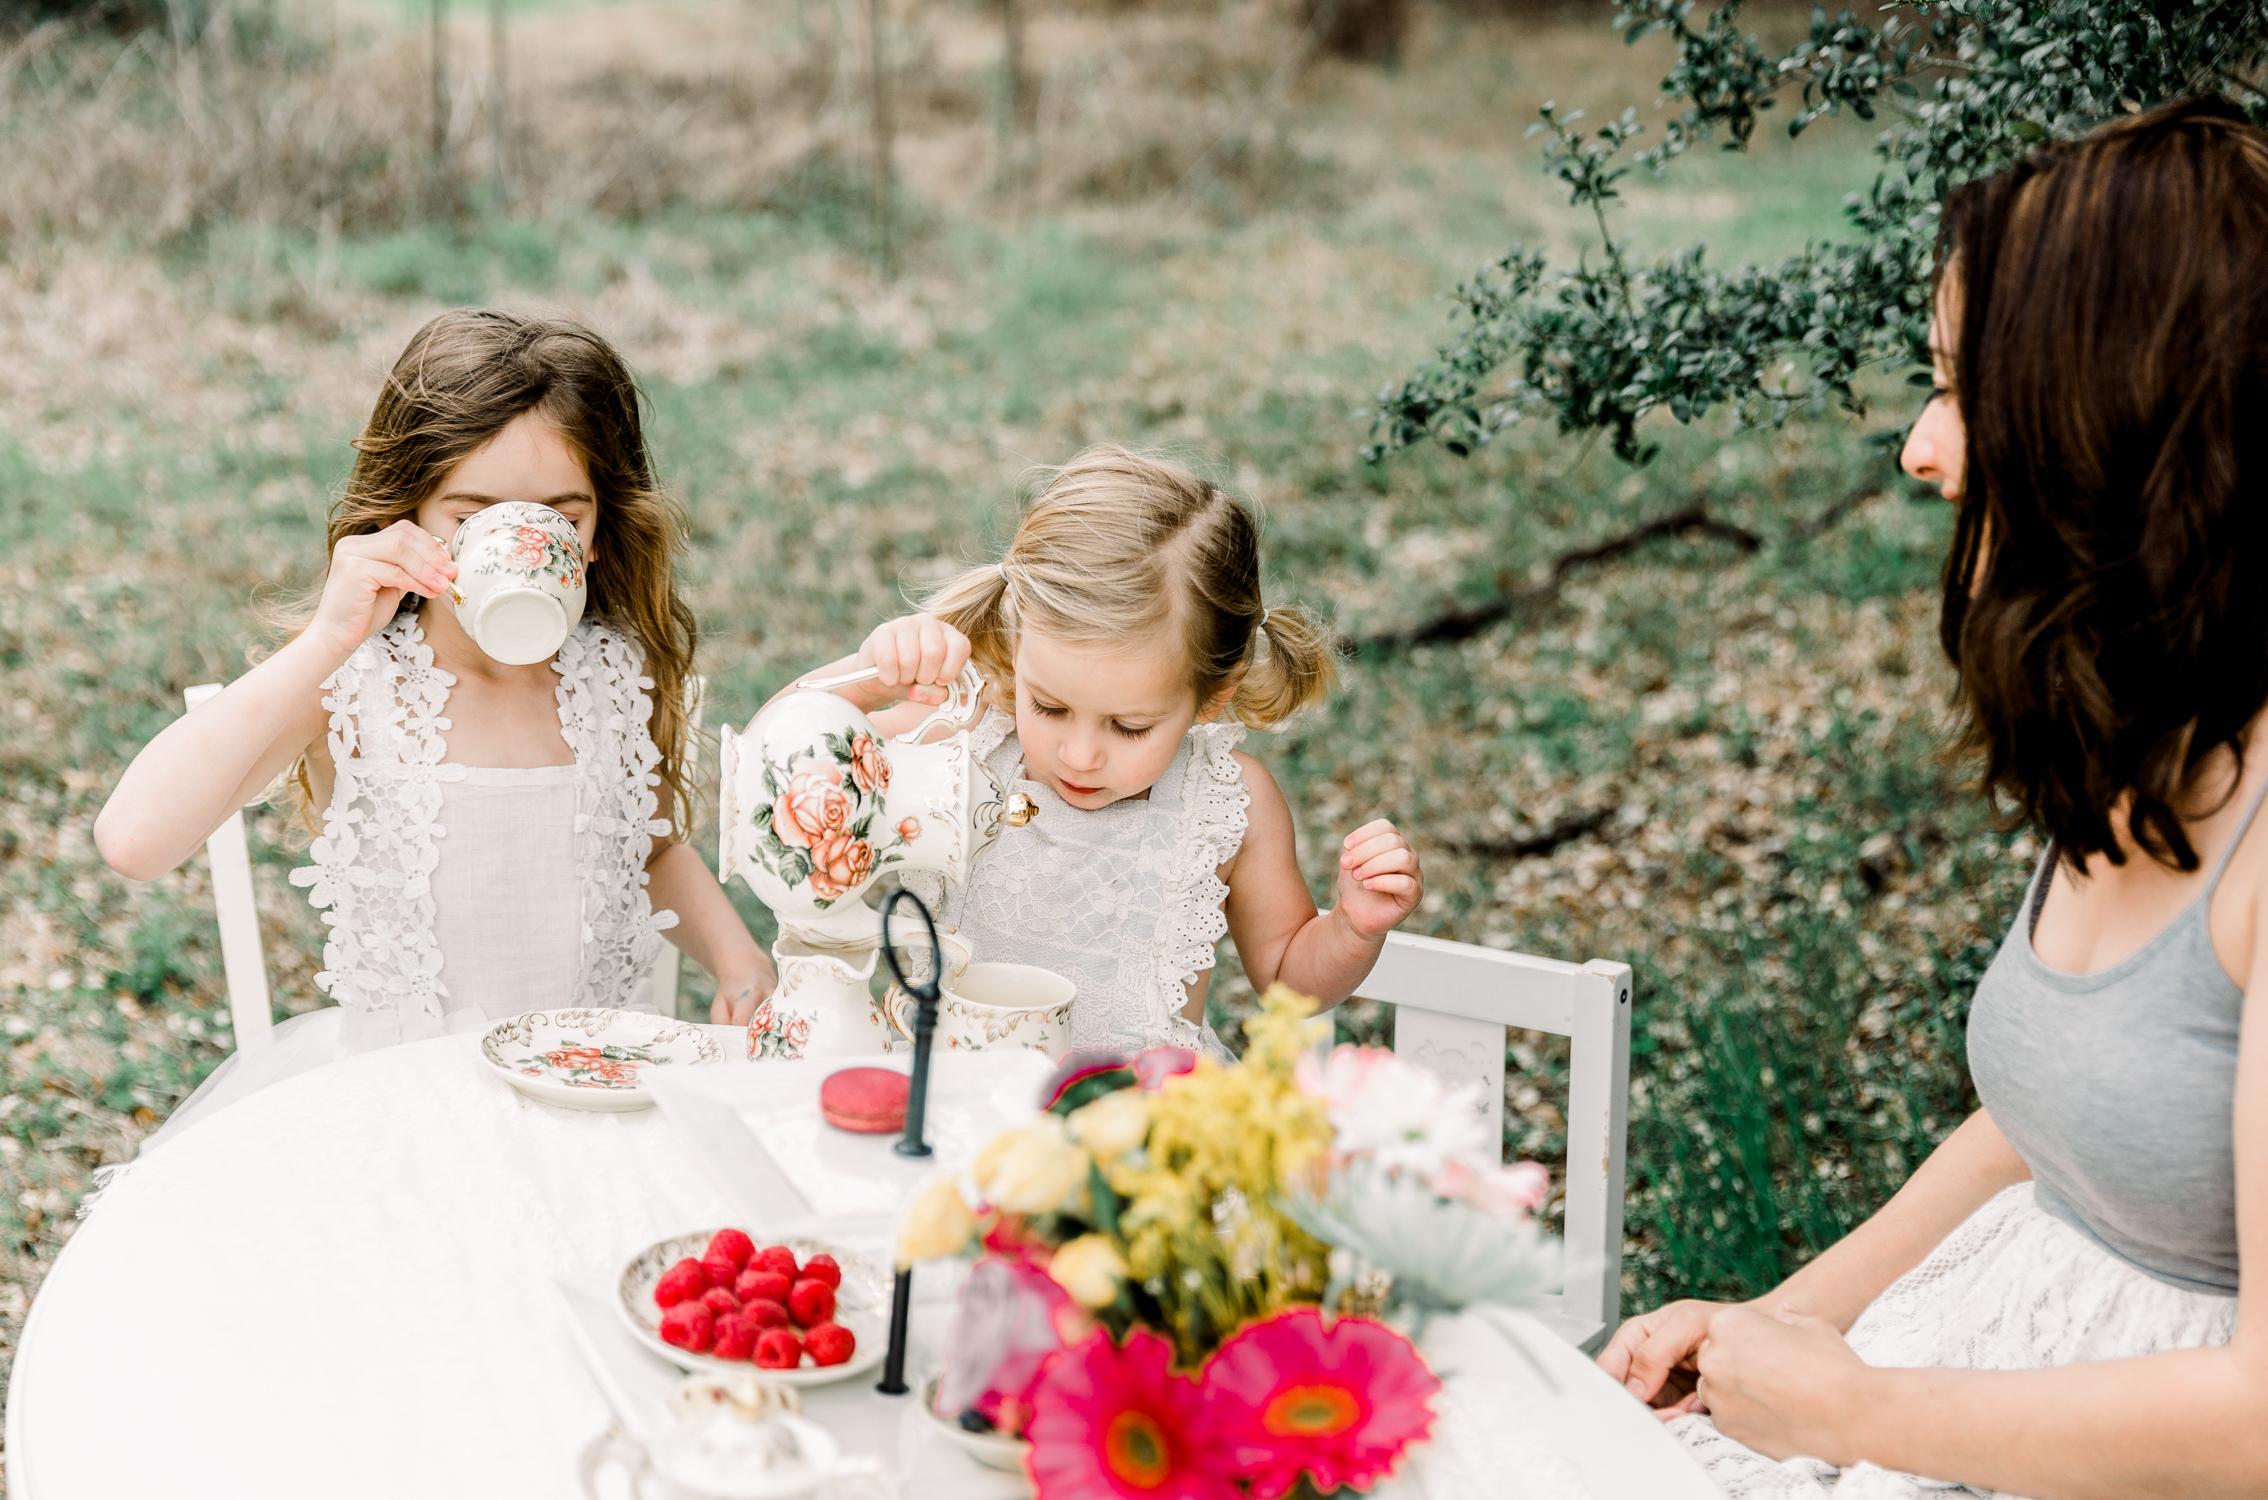 lifestyle-family-photographer-franklin-tea-time-13.jpg